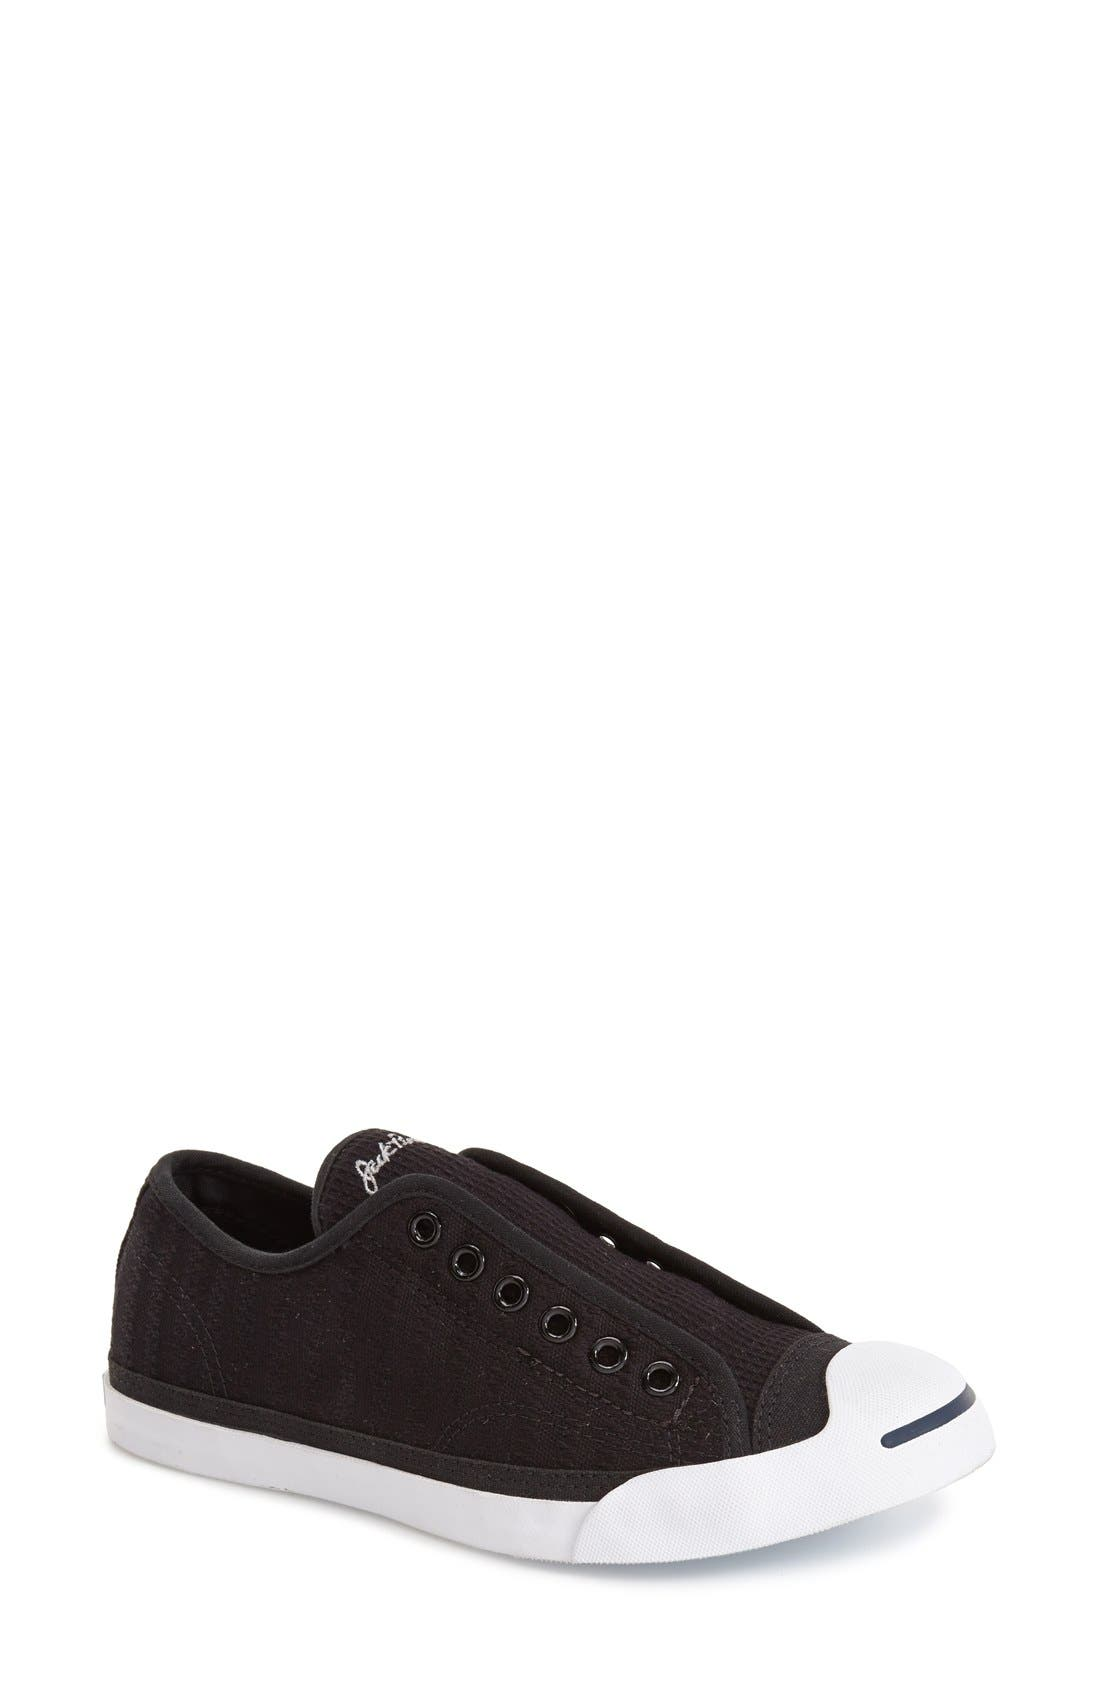 Alternate Image 1 Selected - Converse 'Jack Purcell' Garment Dye Low Top Sneaker (Women) (Nordstrom Exclusive)